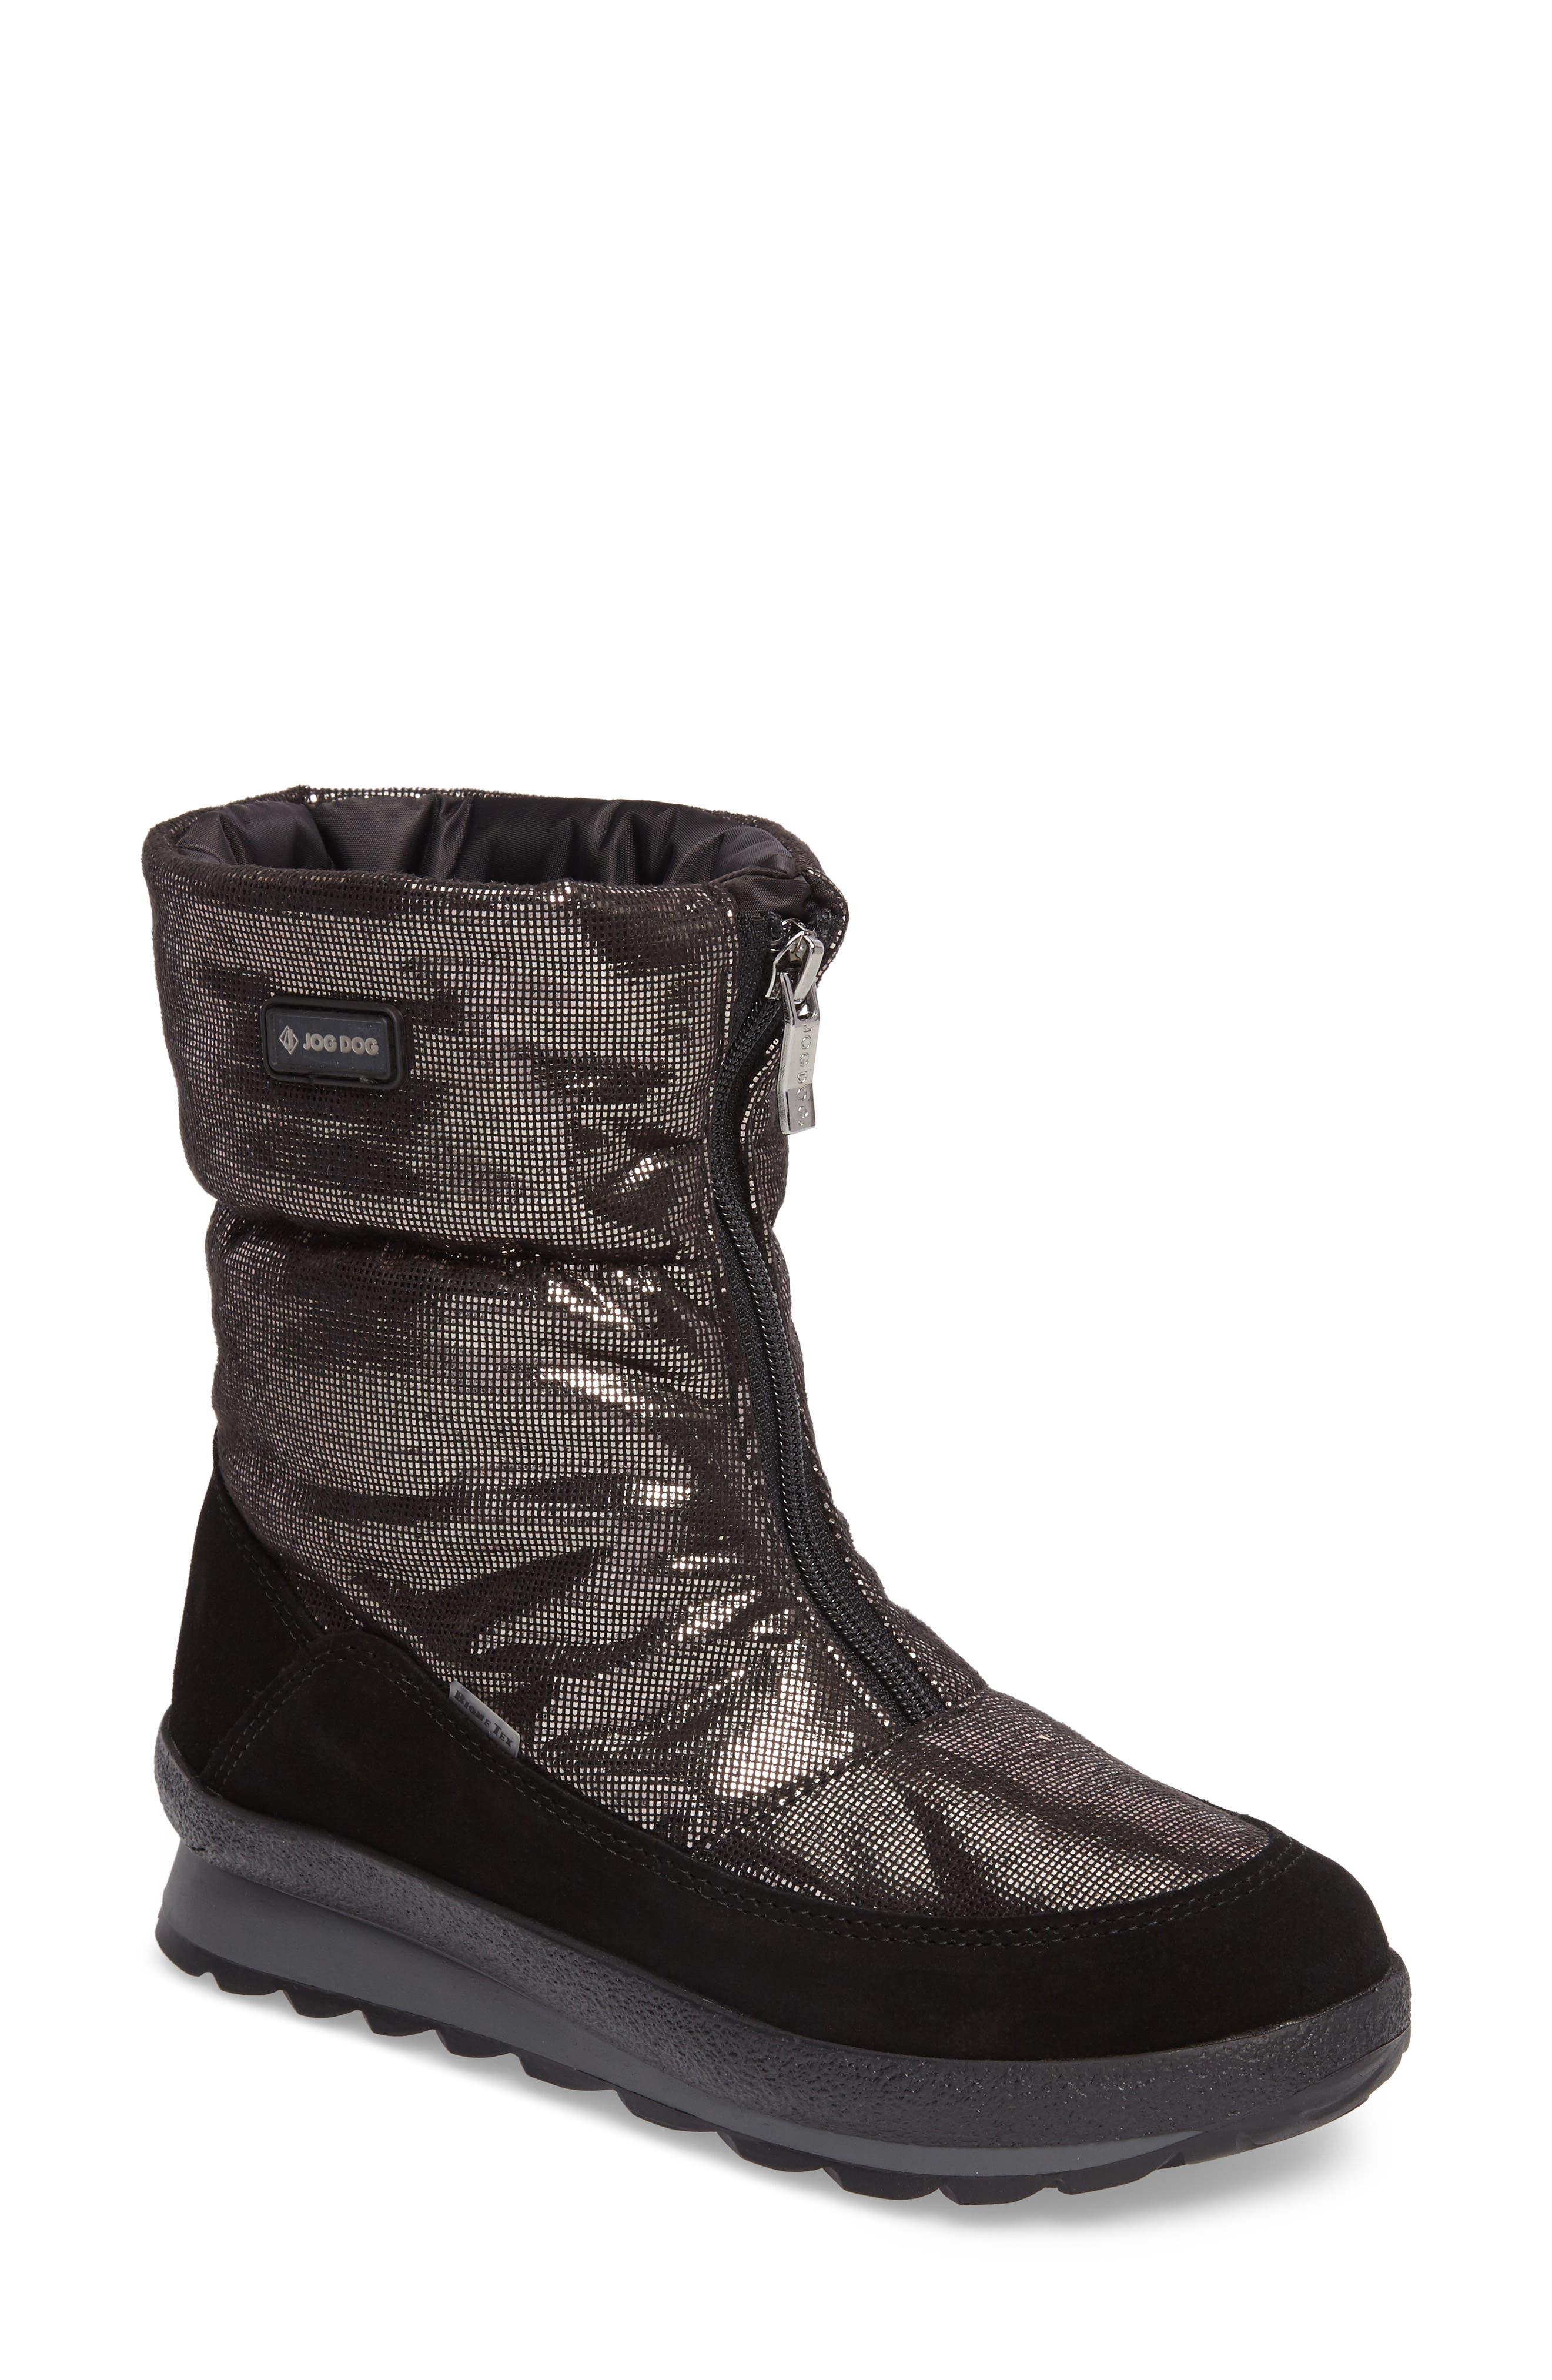 Val Gardena Waterproof Boot,                         Main,                         color, 004